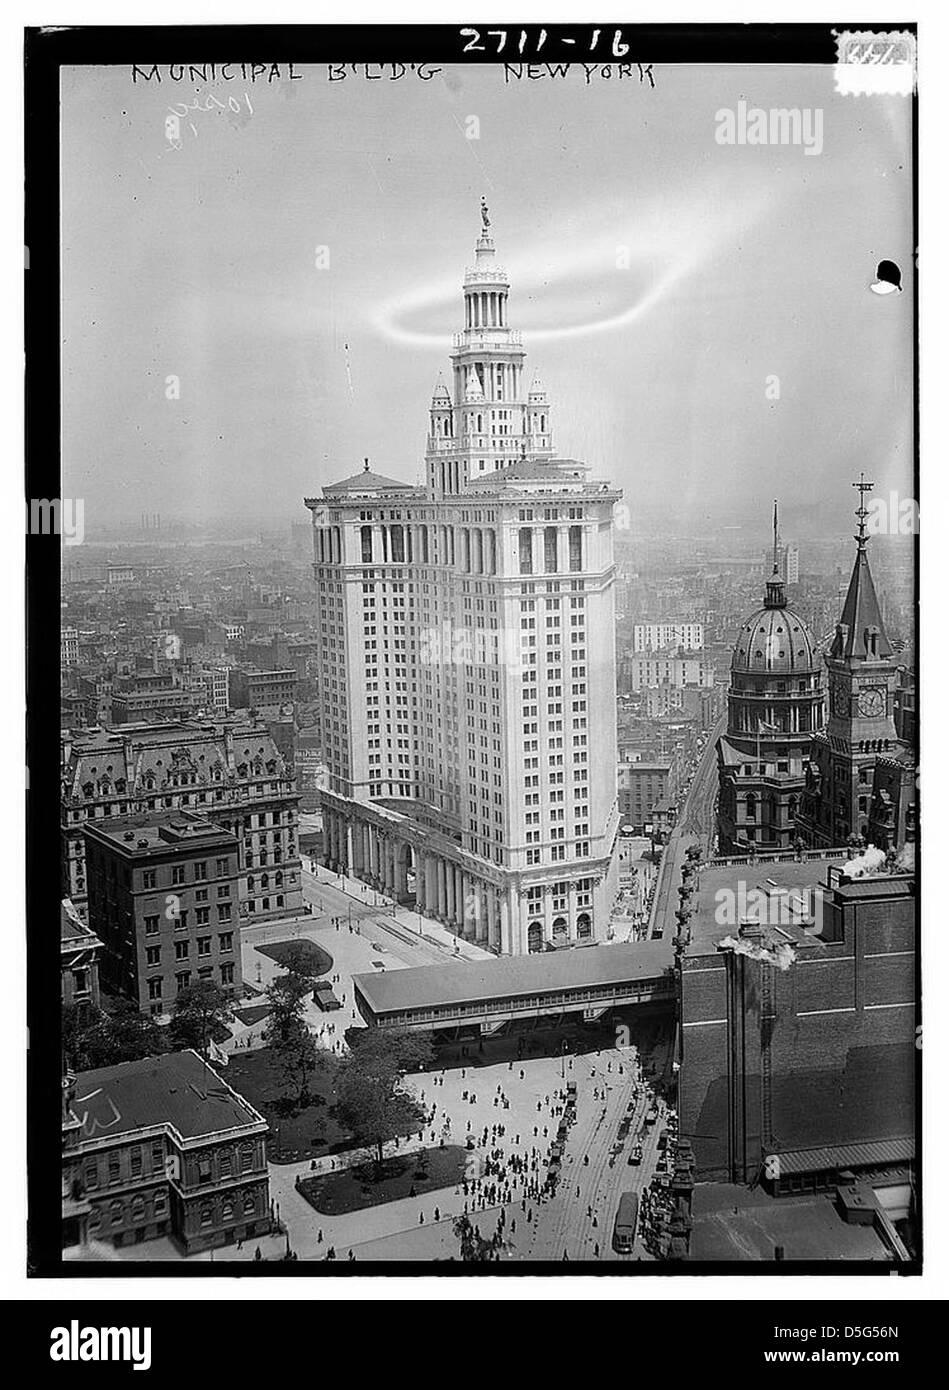 Municipal Bldg. - New York (LOC) - Stock Image